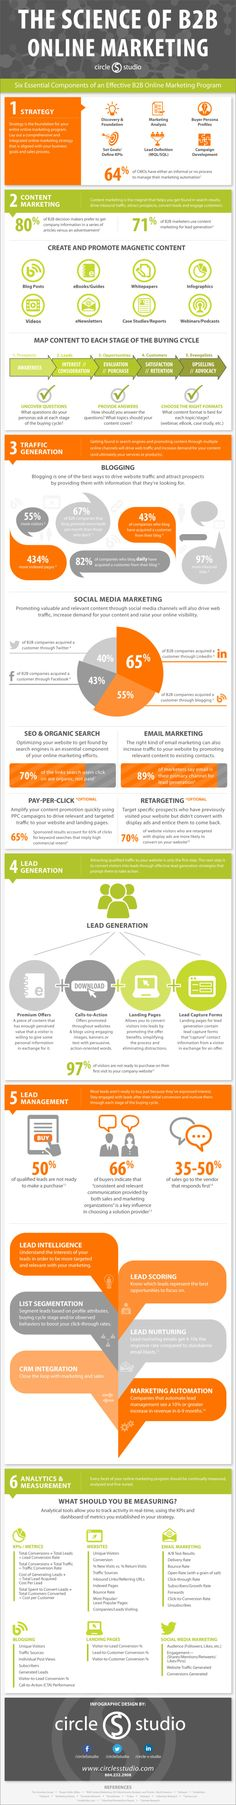 The science of B2B online marketing #infografia #infographic #marketing